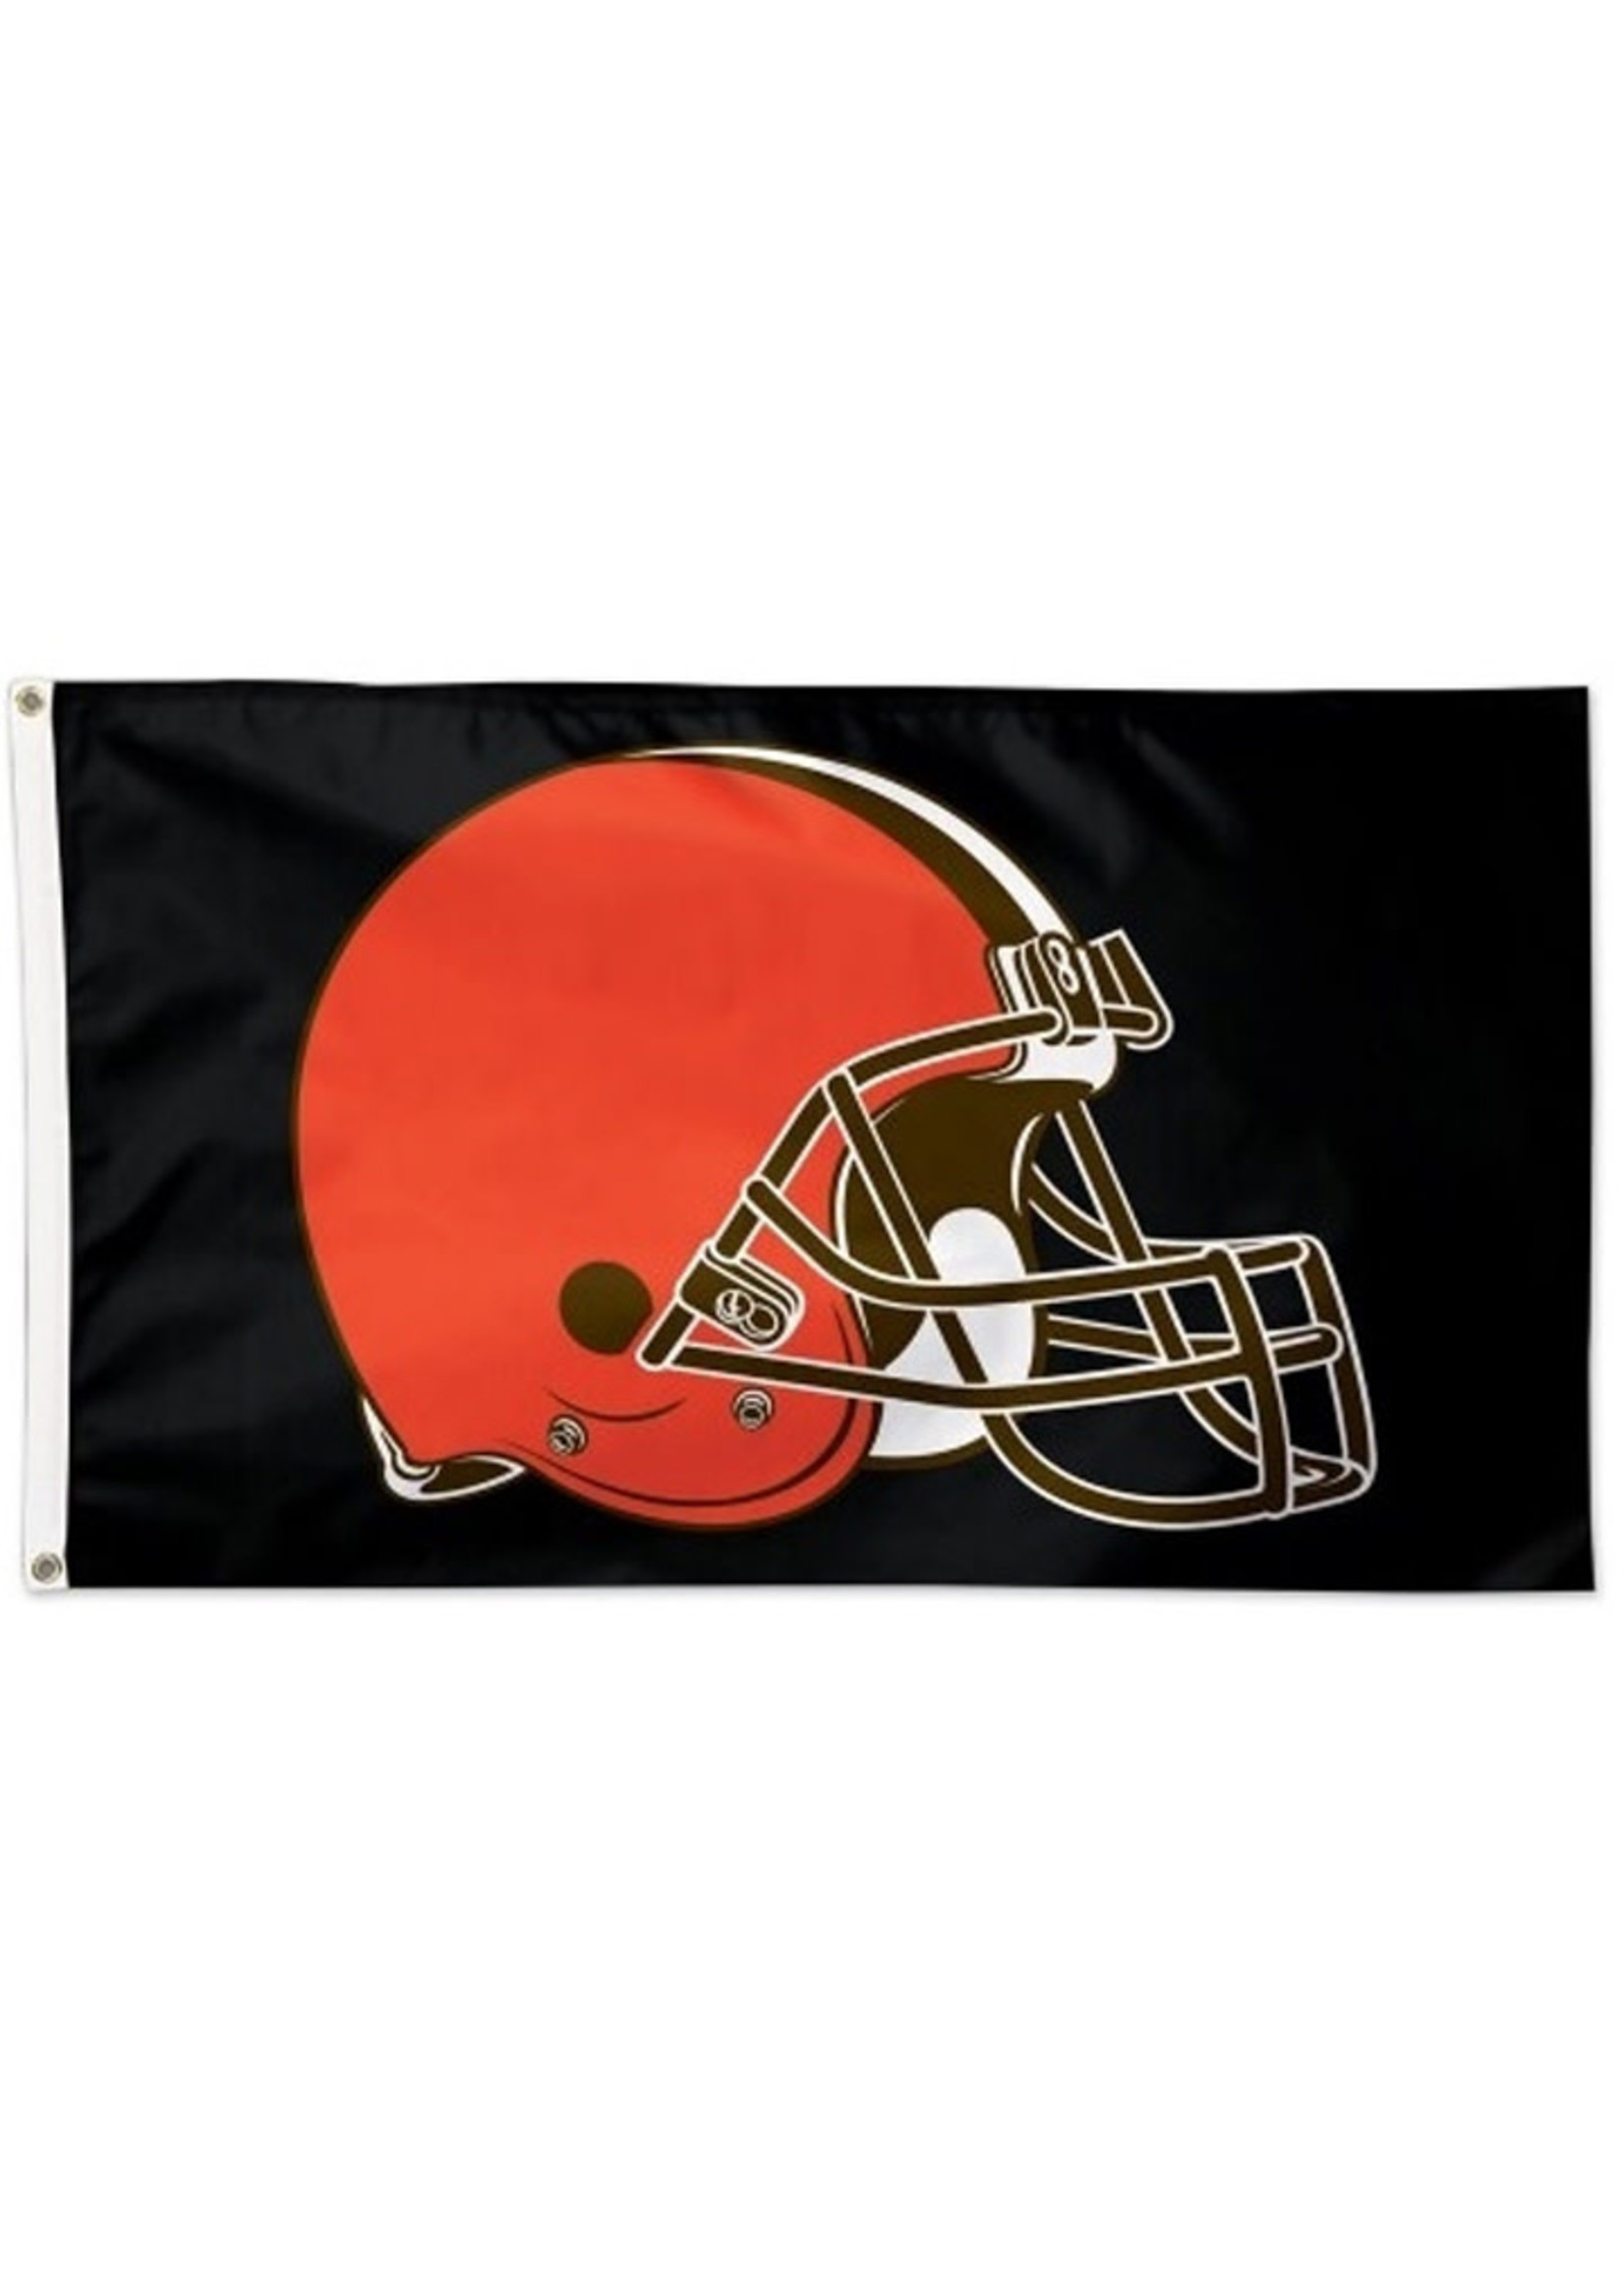 Wincraft Cleveland Browns 3x5 Helmet Flag on Black